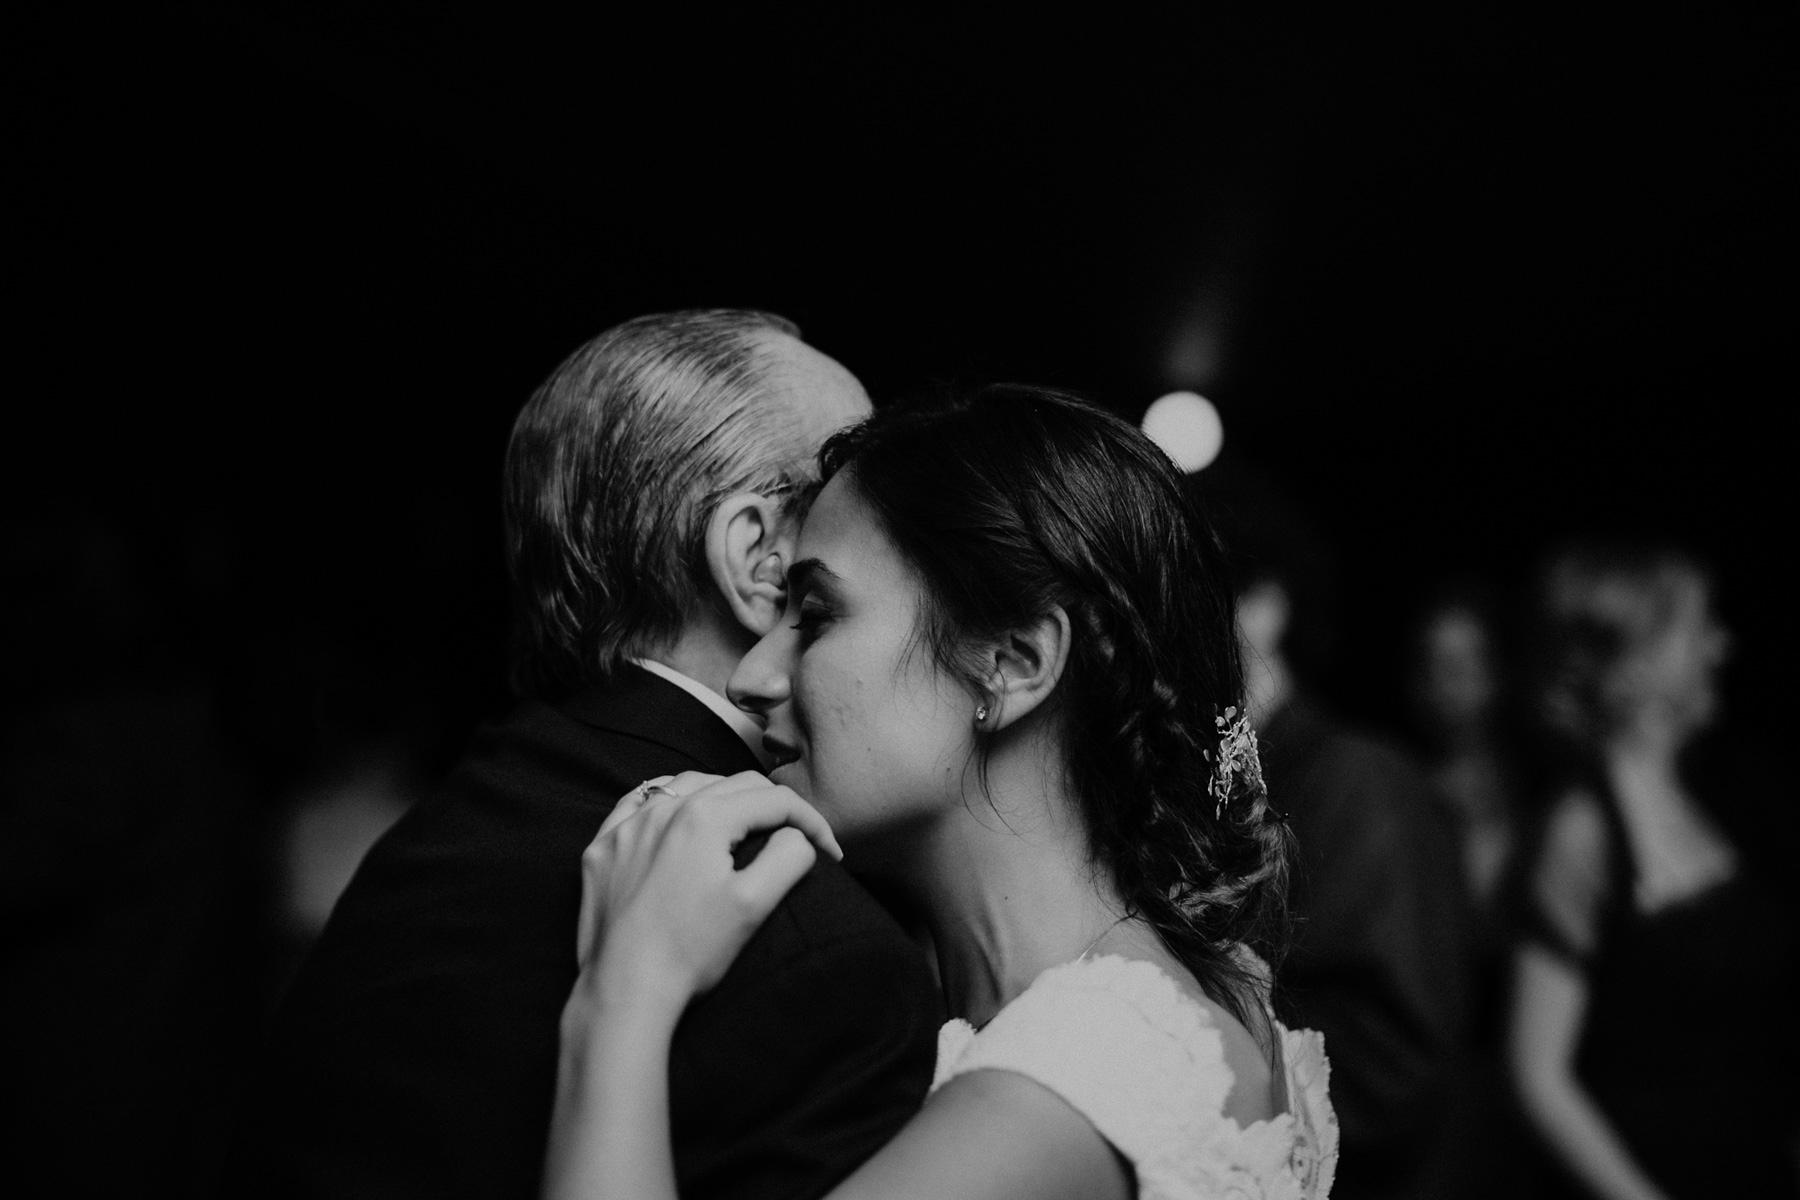 fotografo de bodas Jairo Crena-52